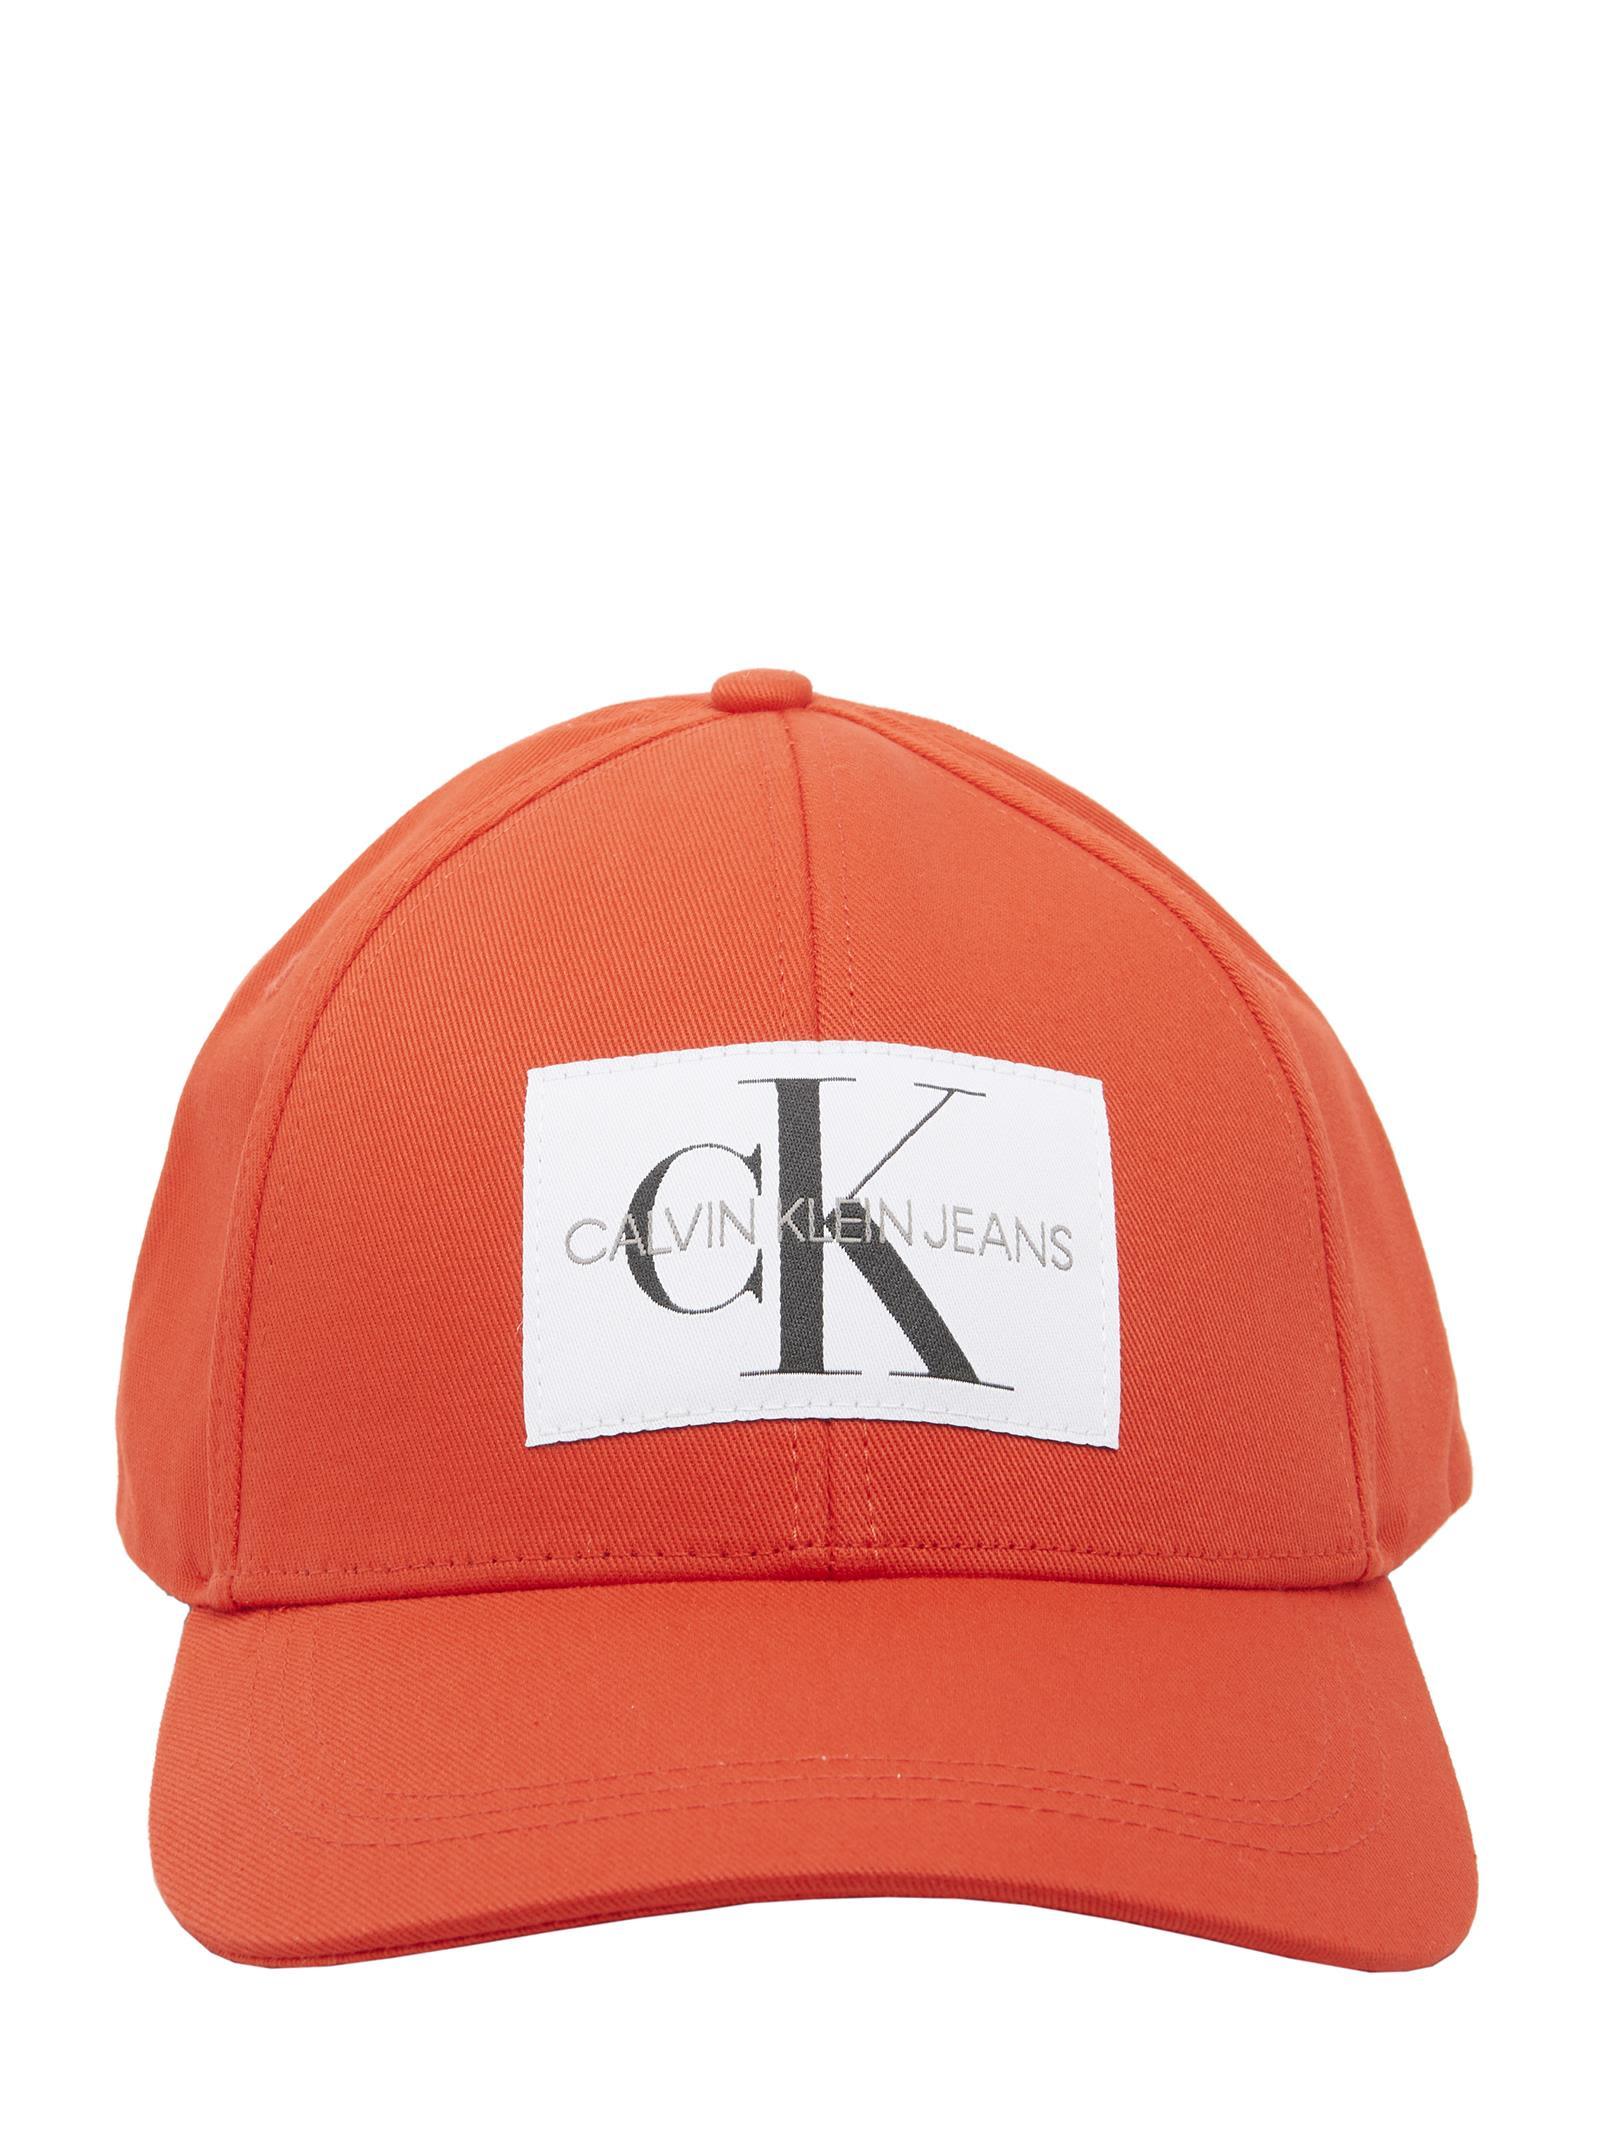 calvin klein jeans -  'monogram' Cap